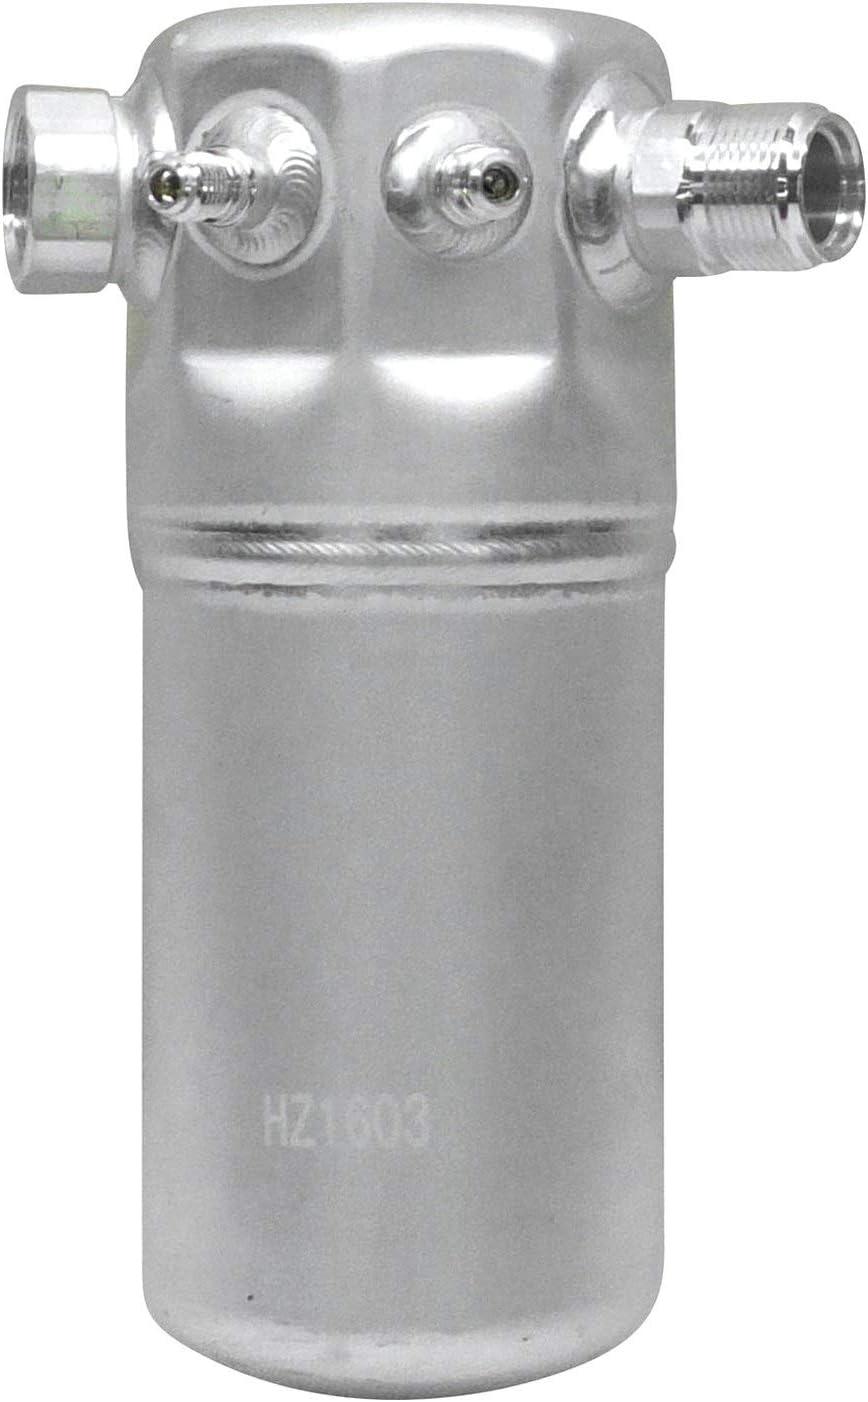 Gorgeous UAC RD6257C Special Campaign - C A Accumulator